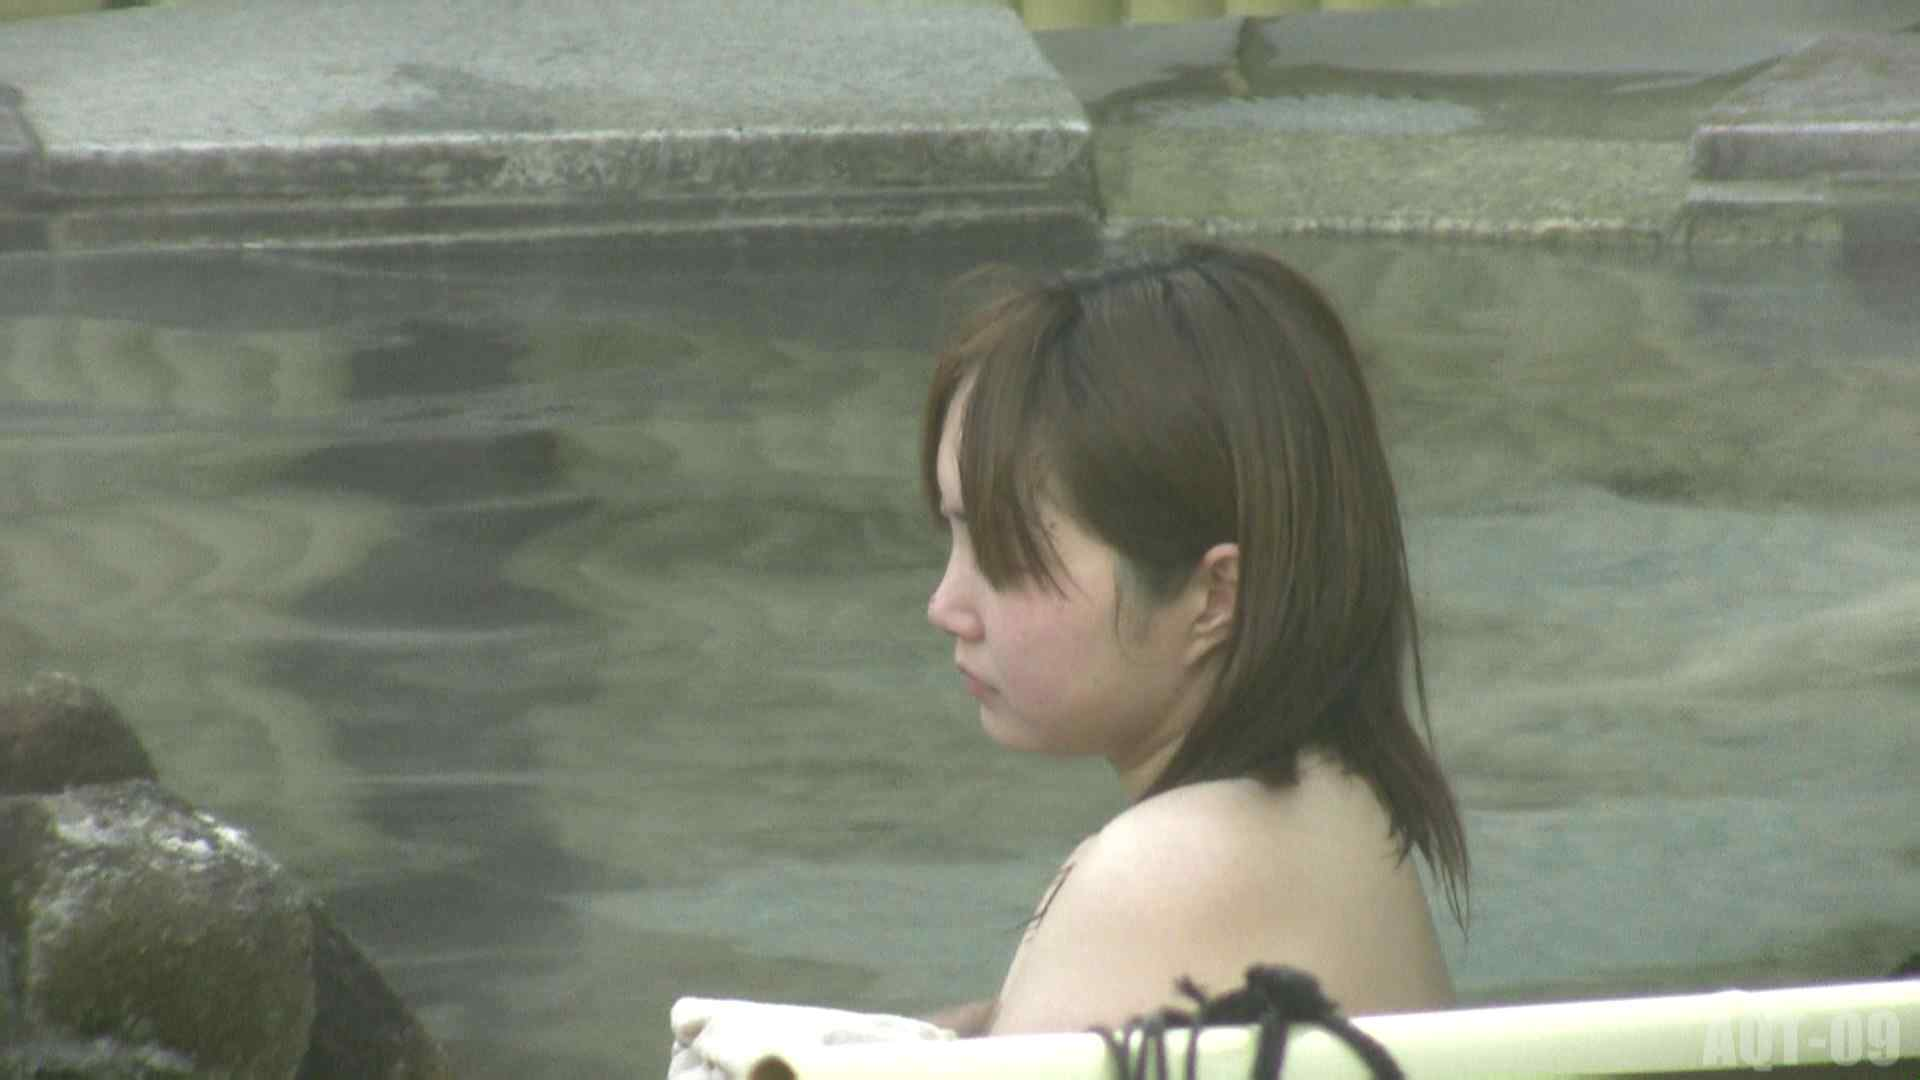 Aquaな露天風呂Vol.781 露天風呂   OLのエロ生活  93連発 34